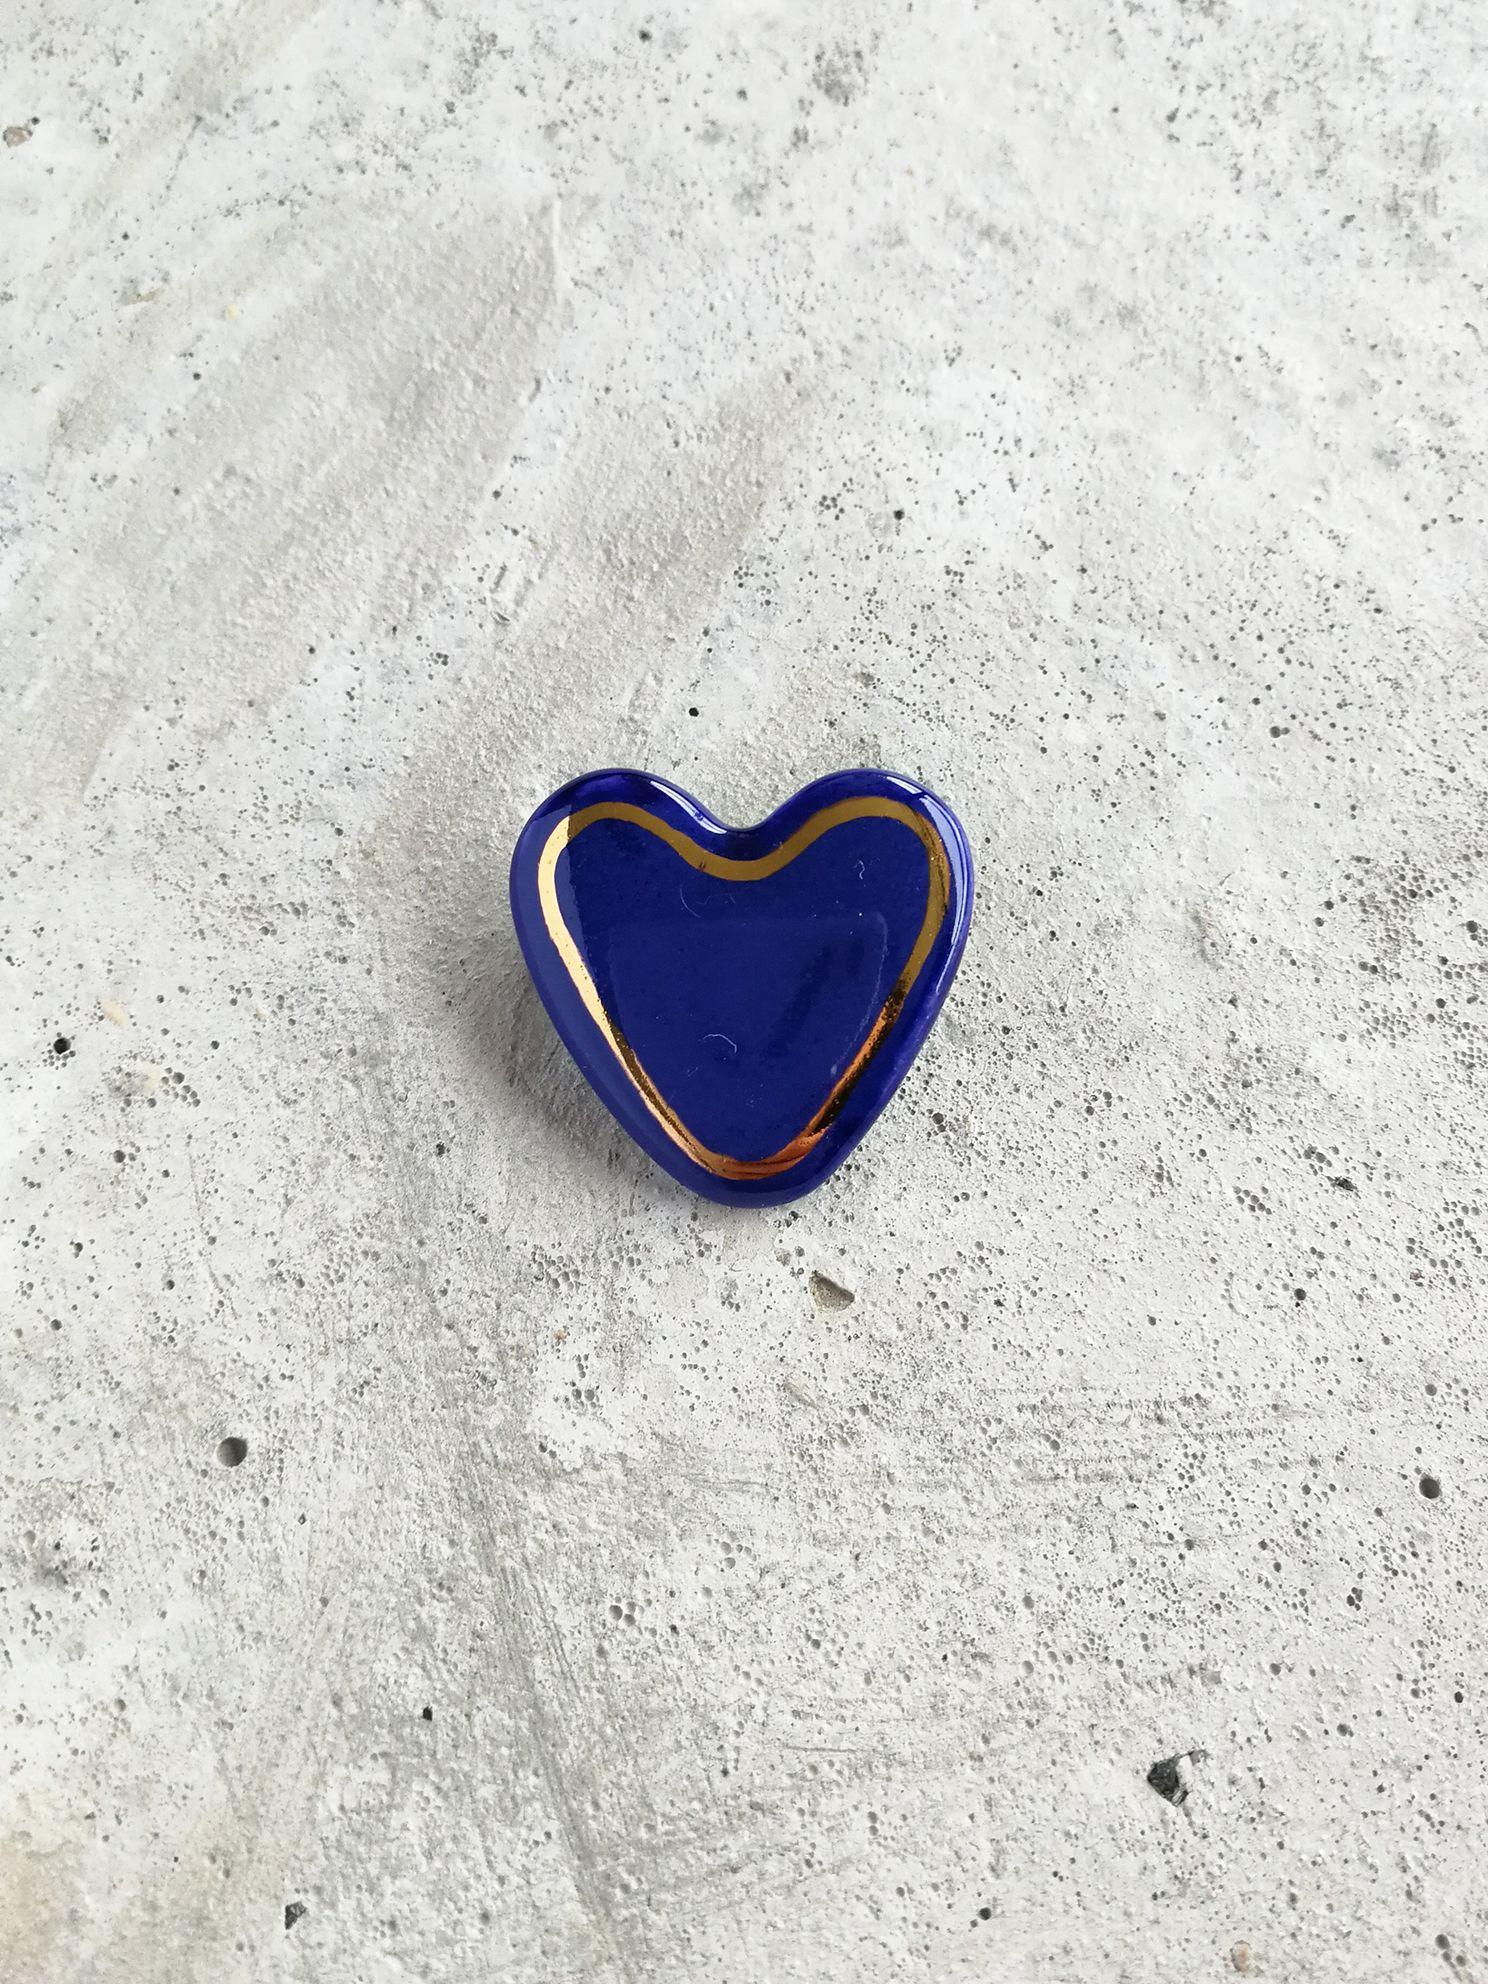 Prendedor de Cerámica Corazón borde Oro Azul